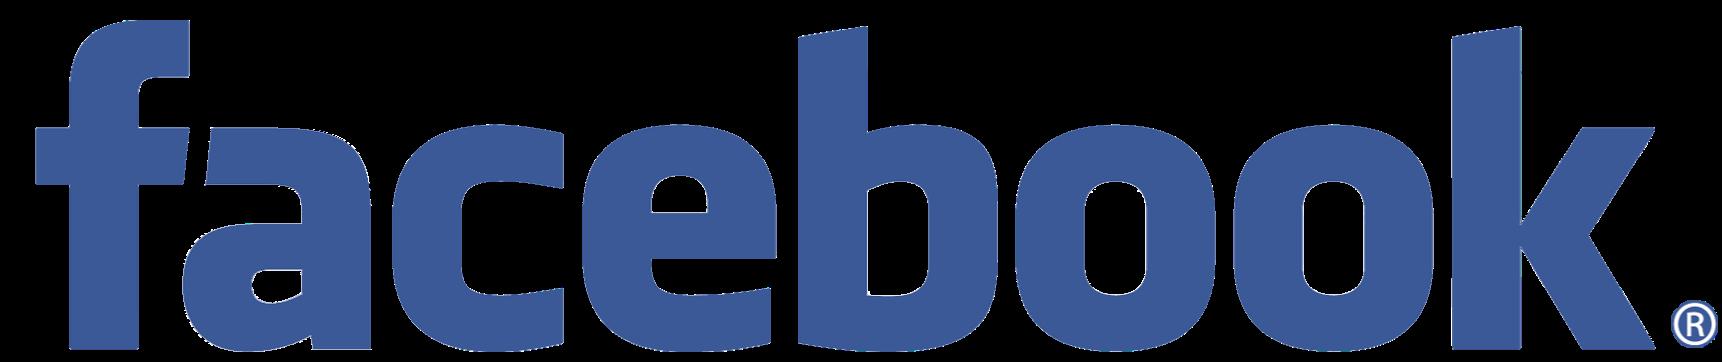 Facebook - Brebreky